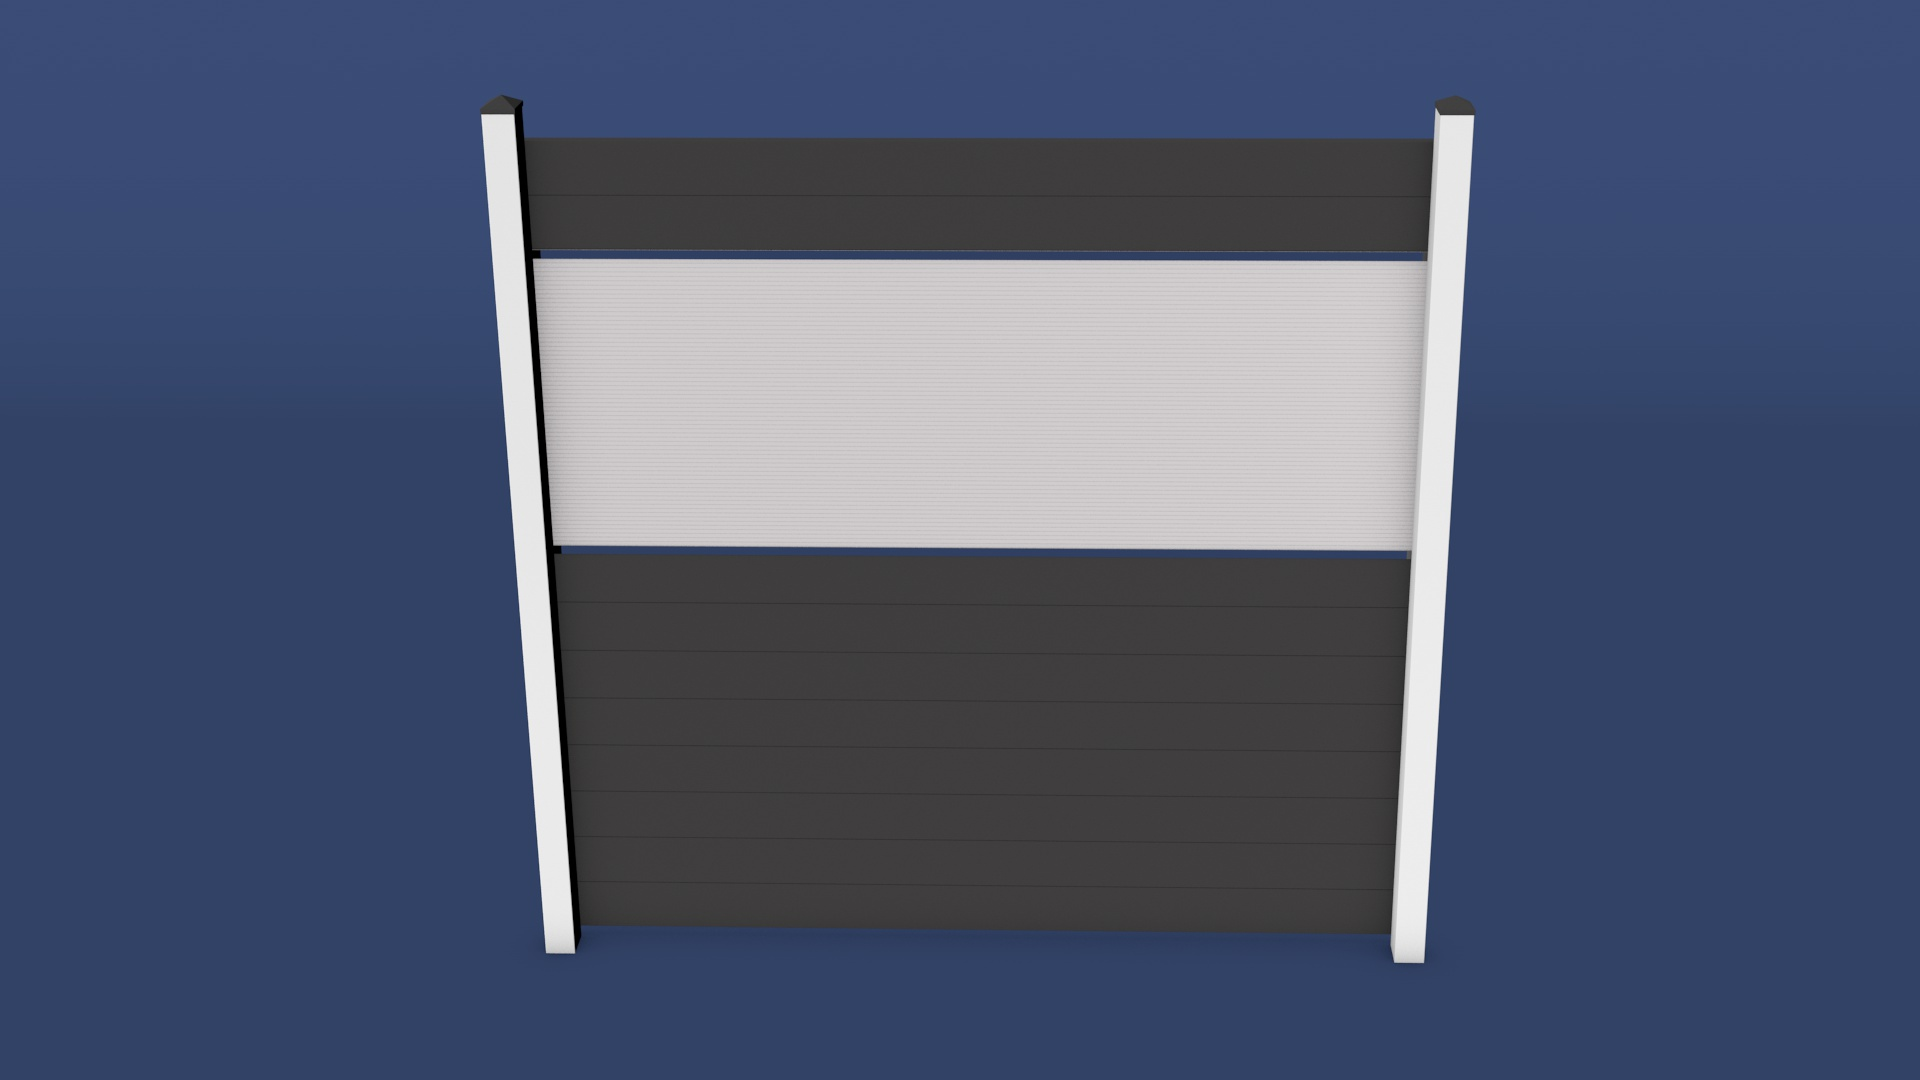 Relativ Kunststoff Zaun Kolja - Idealer Sichtschutzzaun in 2000 x 2000 mm CR41